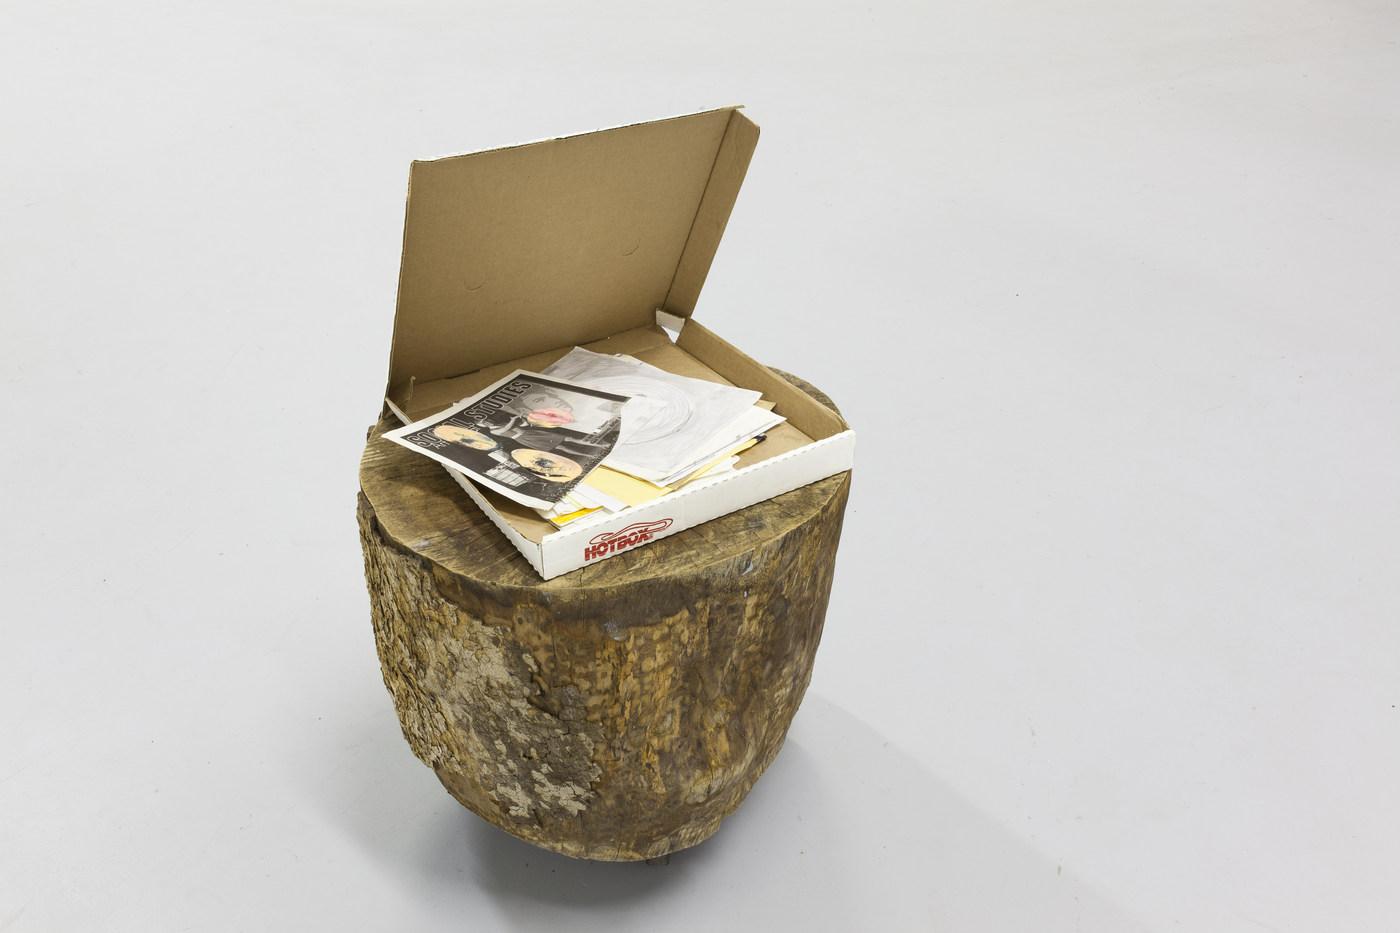 PaperPaperAlexBecerra34